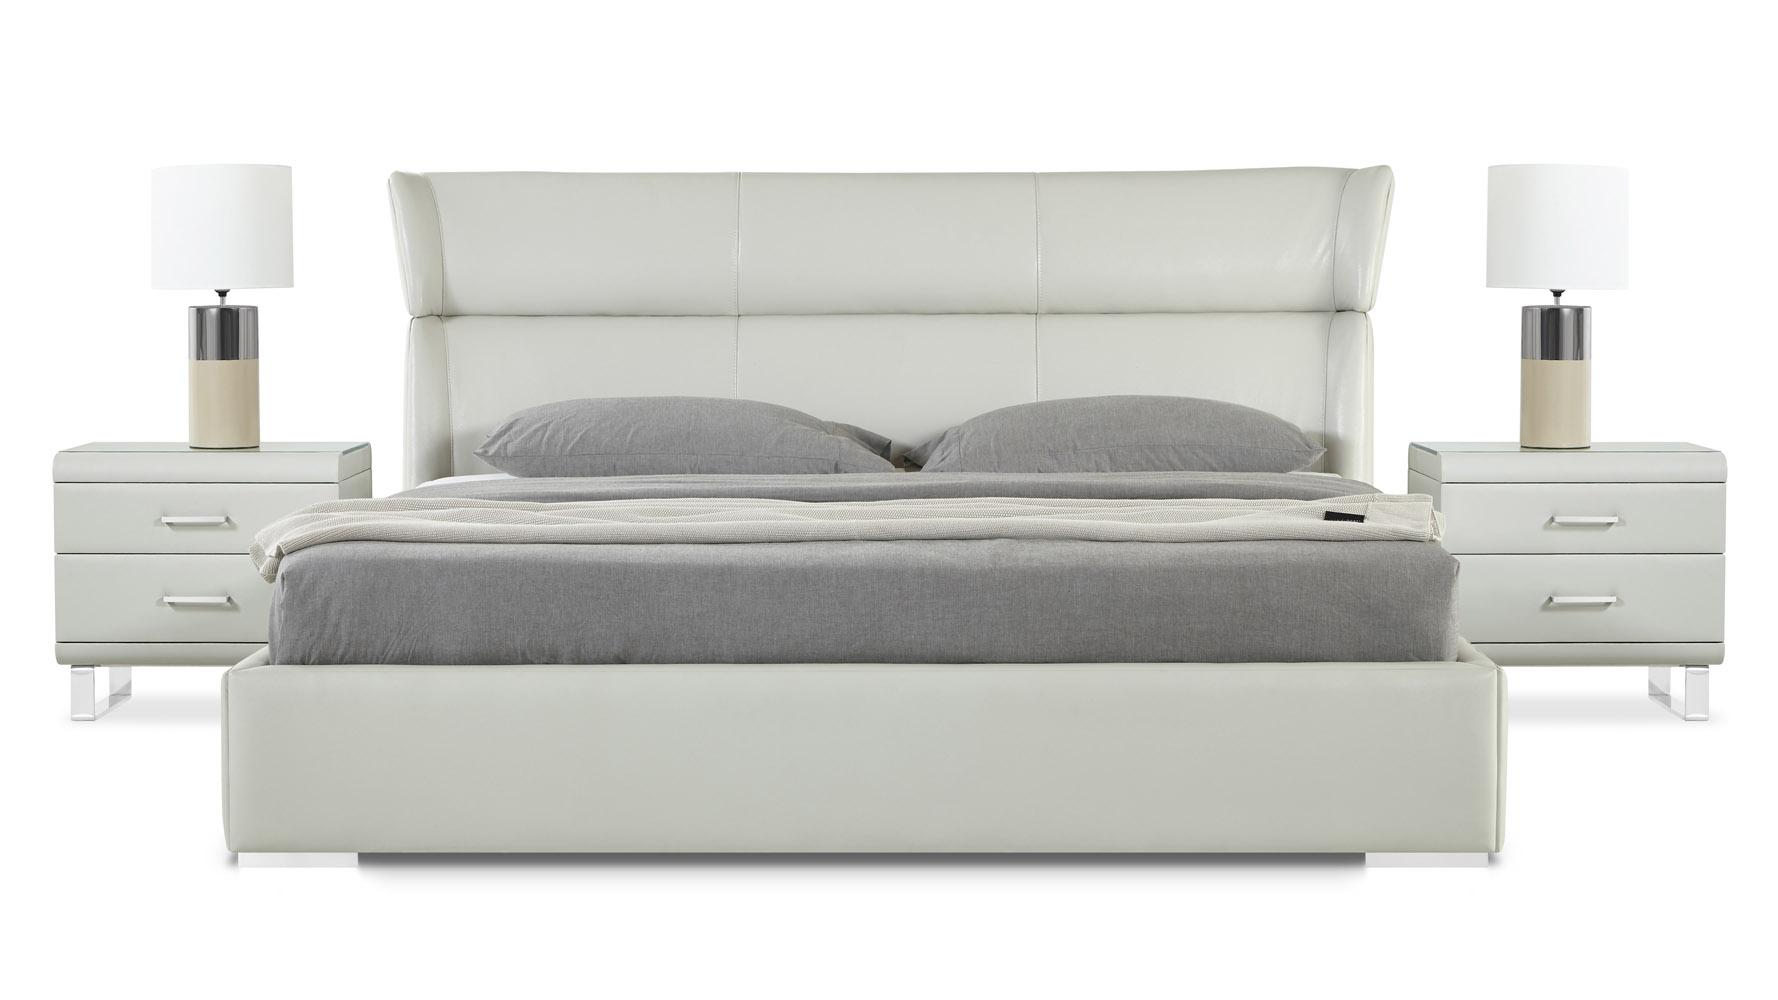 light grey leather sofa bed set online china hypnos platform zuri furniture